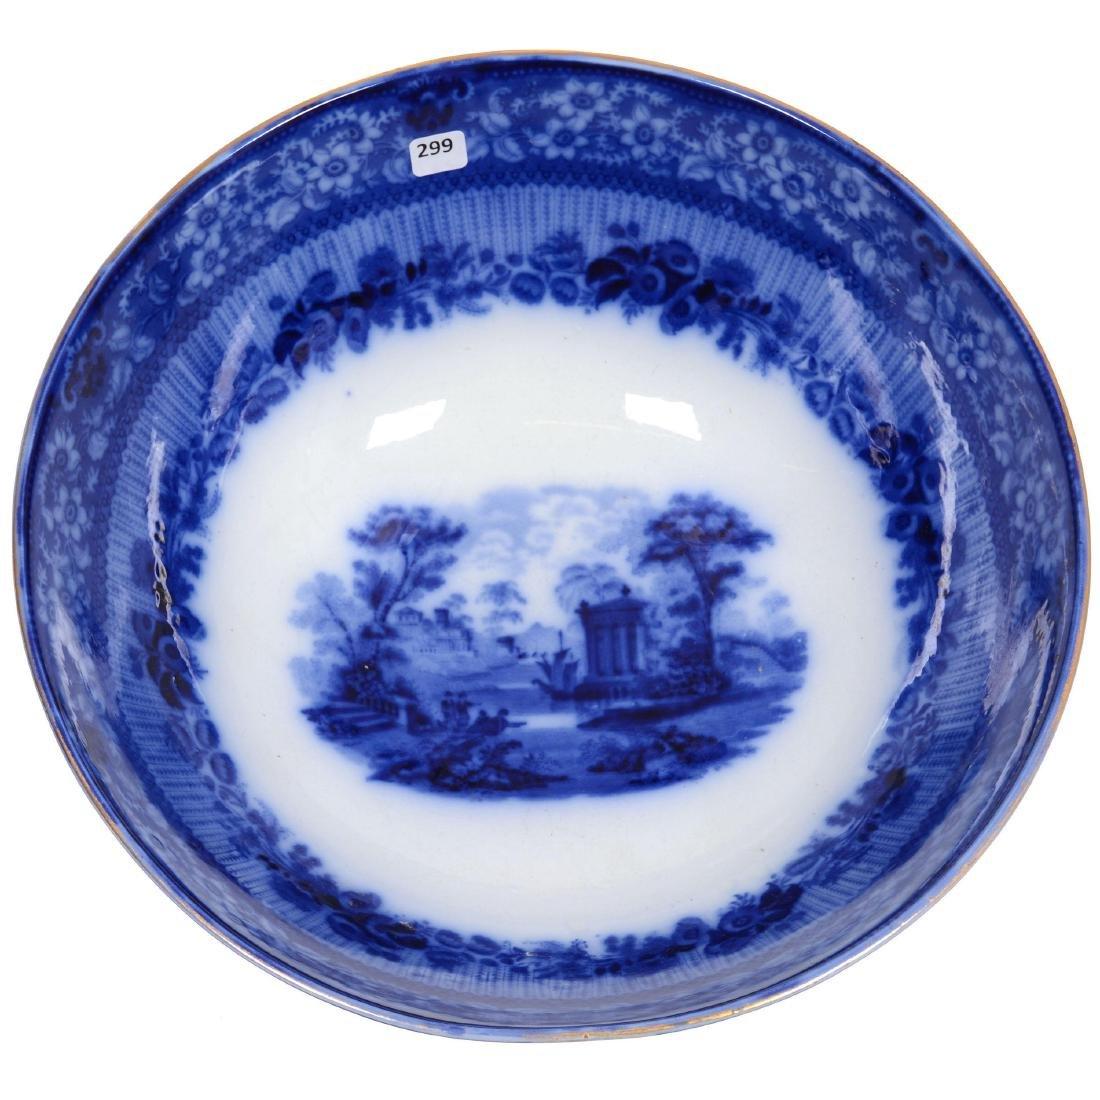 Flow Blue Grecian Pattern Pedestal Punch Bowl - 2